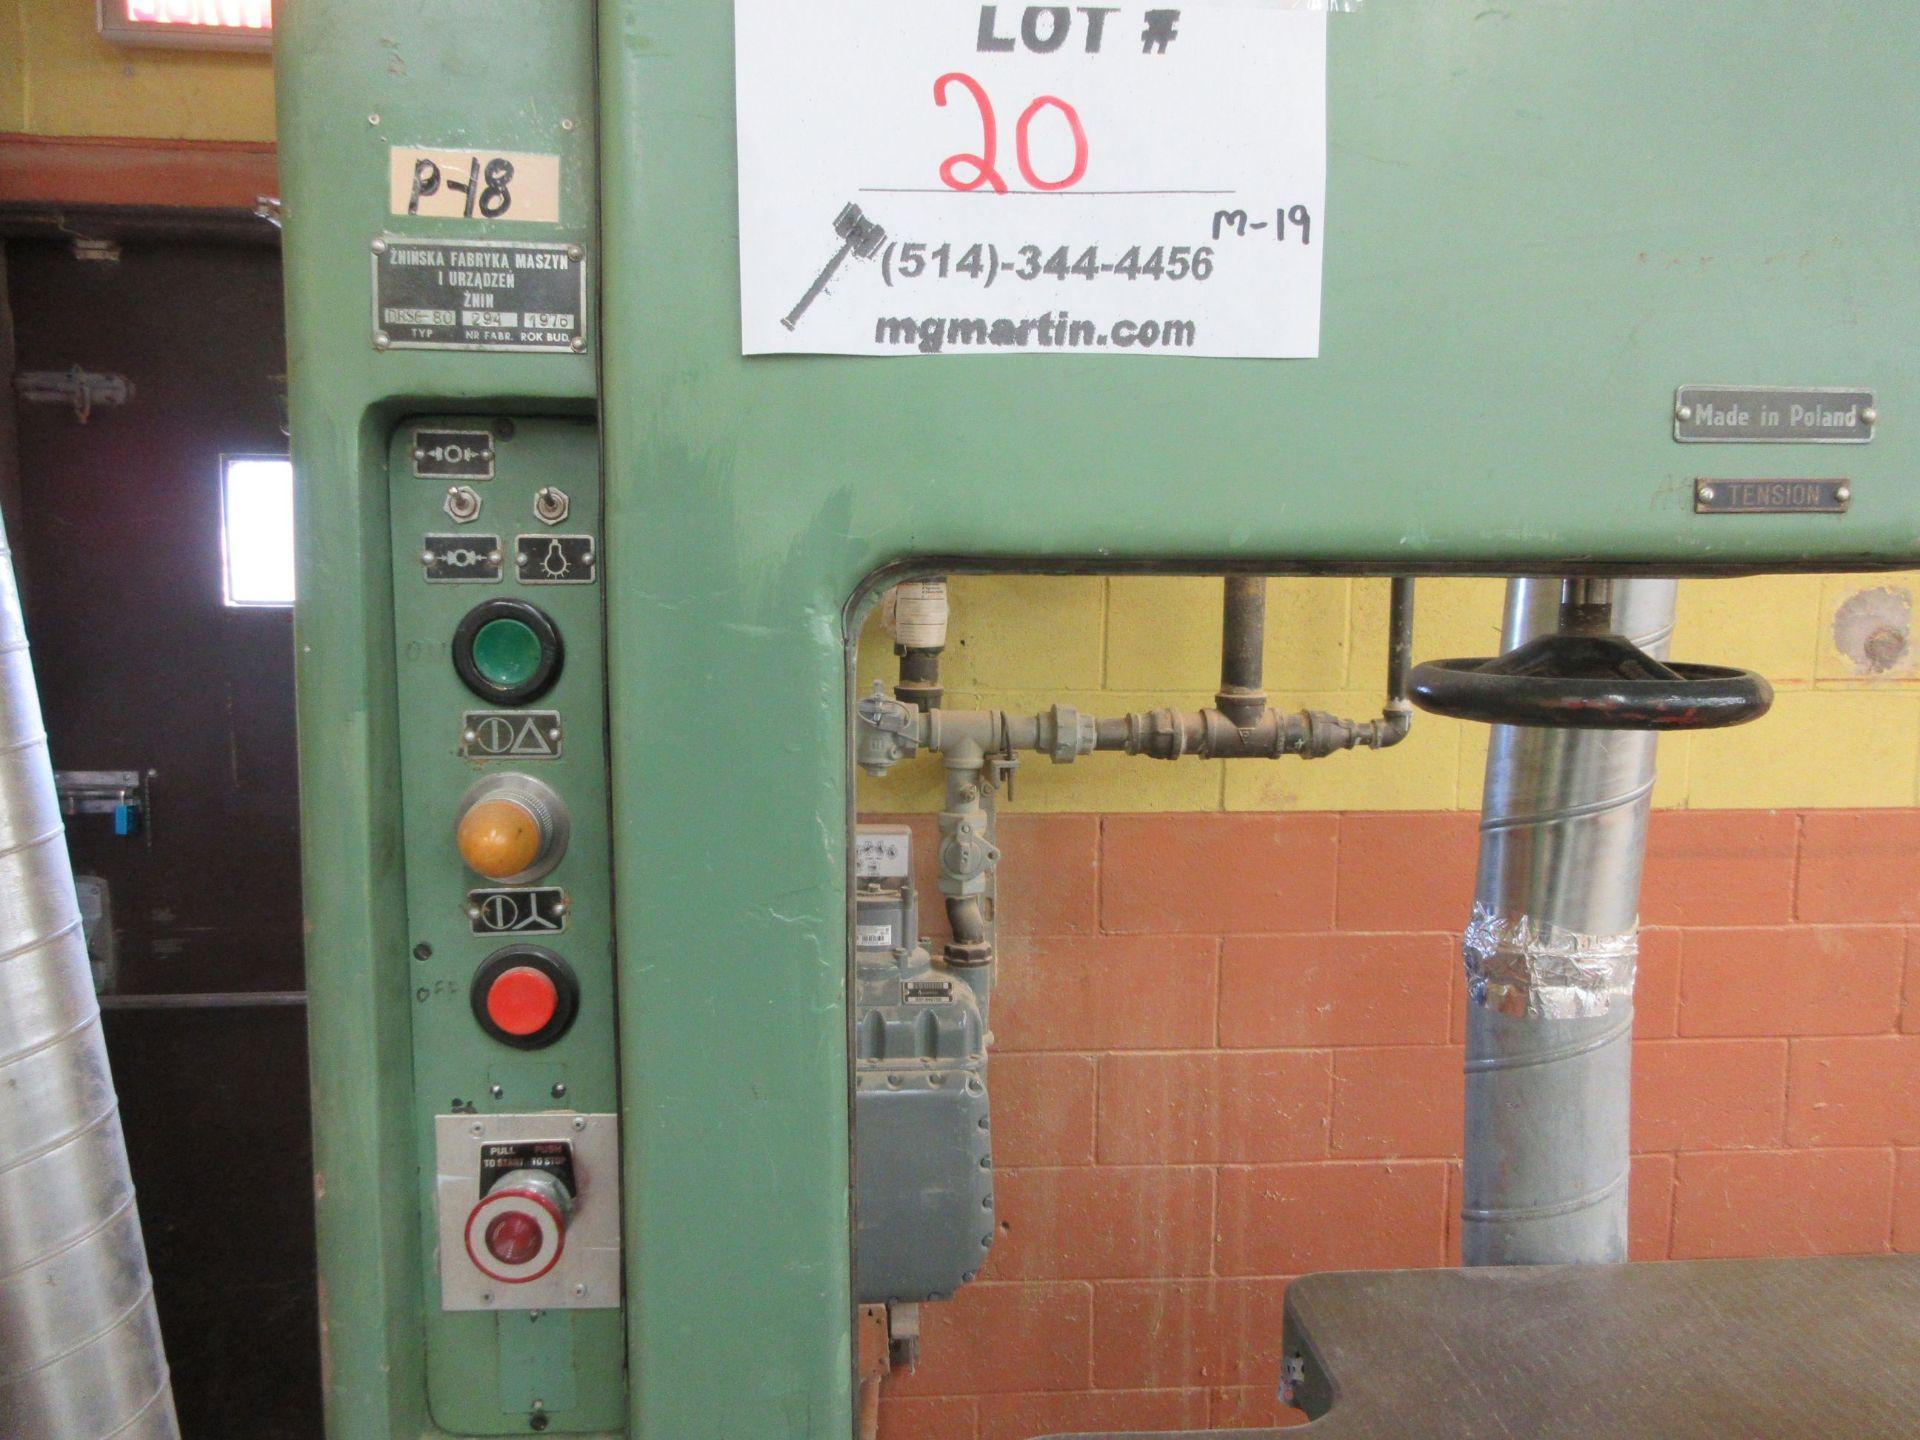 "Lot 20 - ZEFAM 28"" band saw, Mod: DRSC-80, 5 HP, 600 volts"